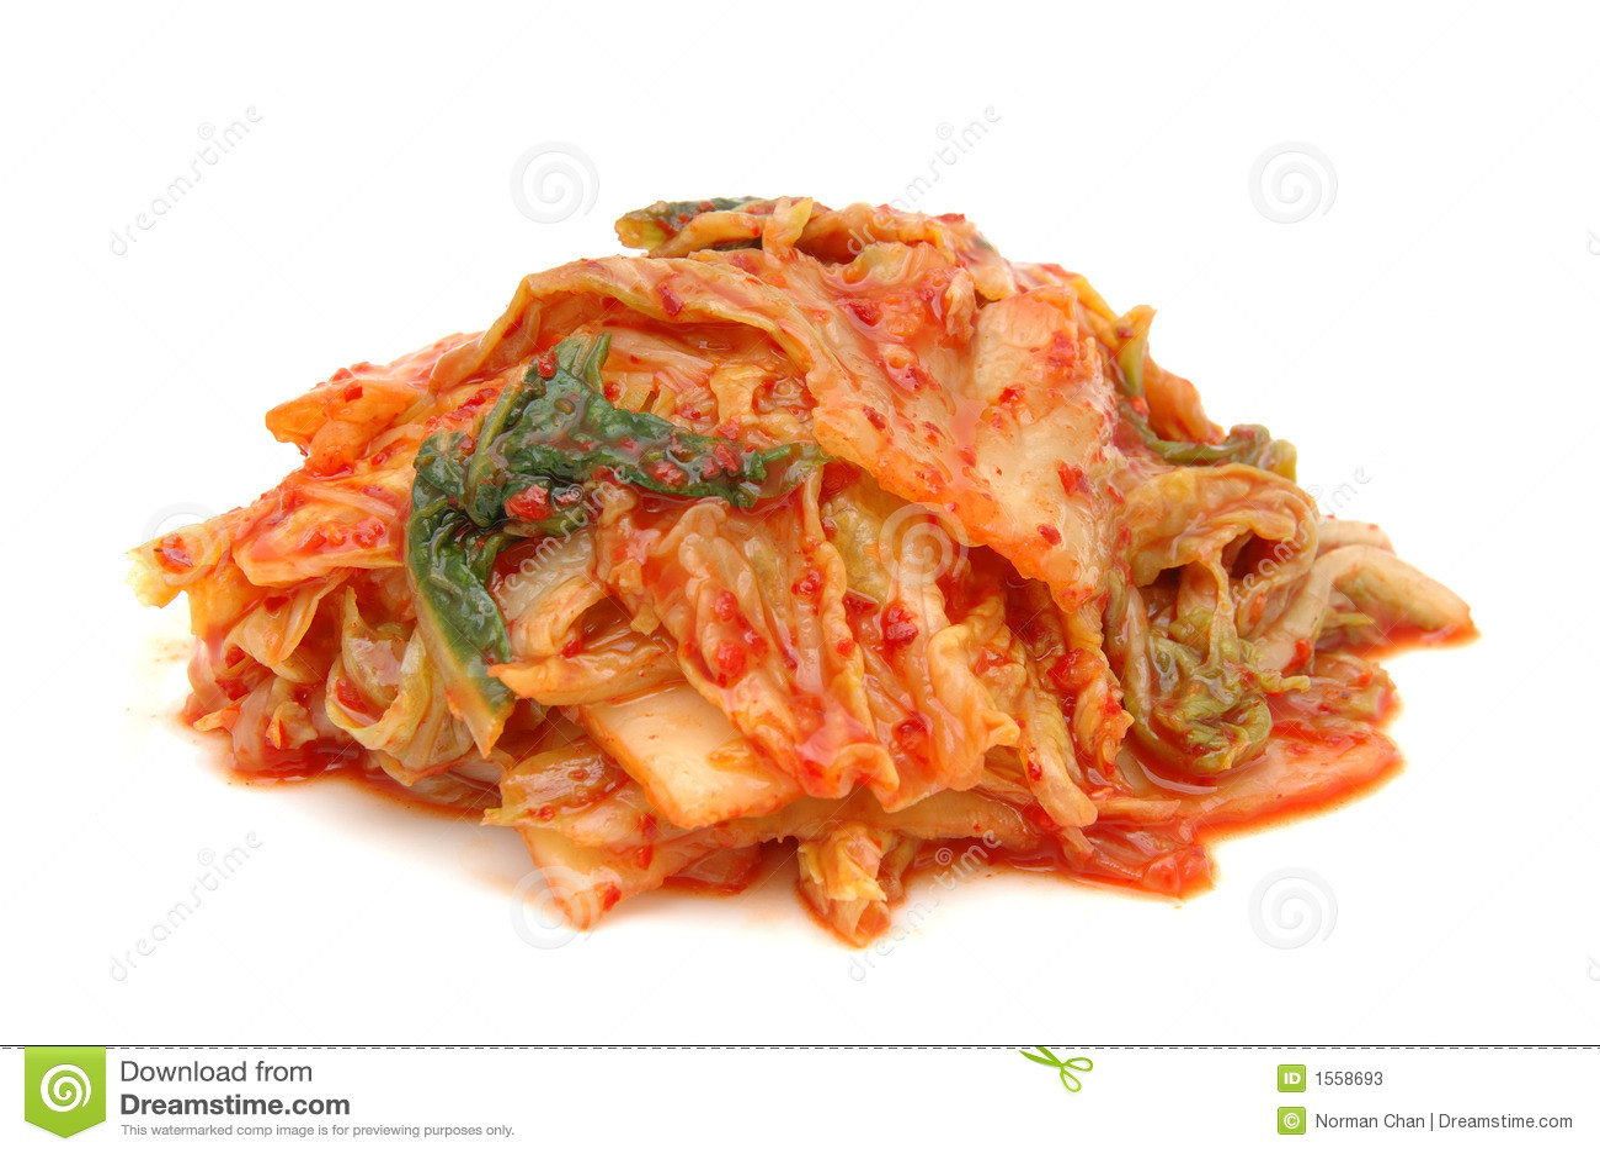 Kimchi Stock Photos - Image: 1558693